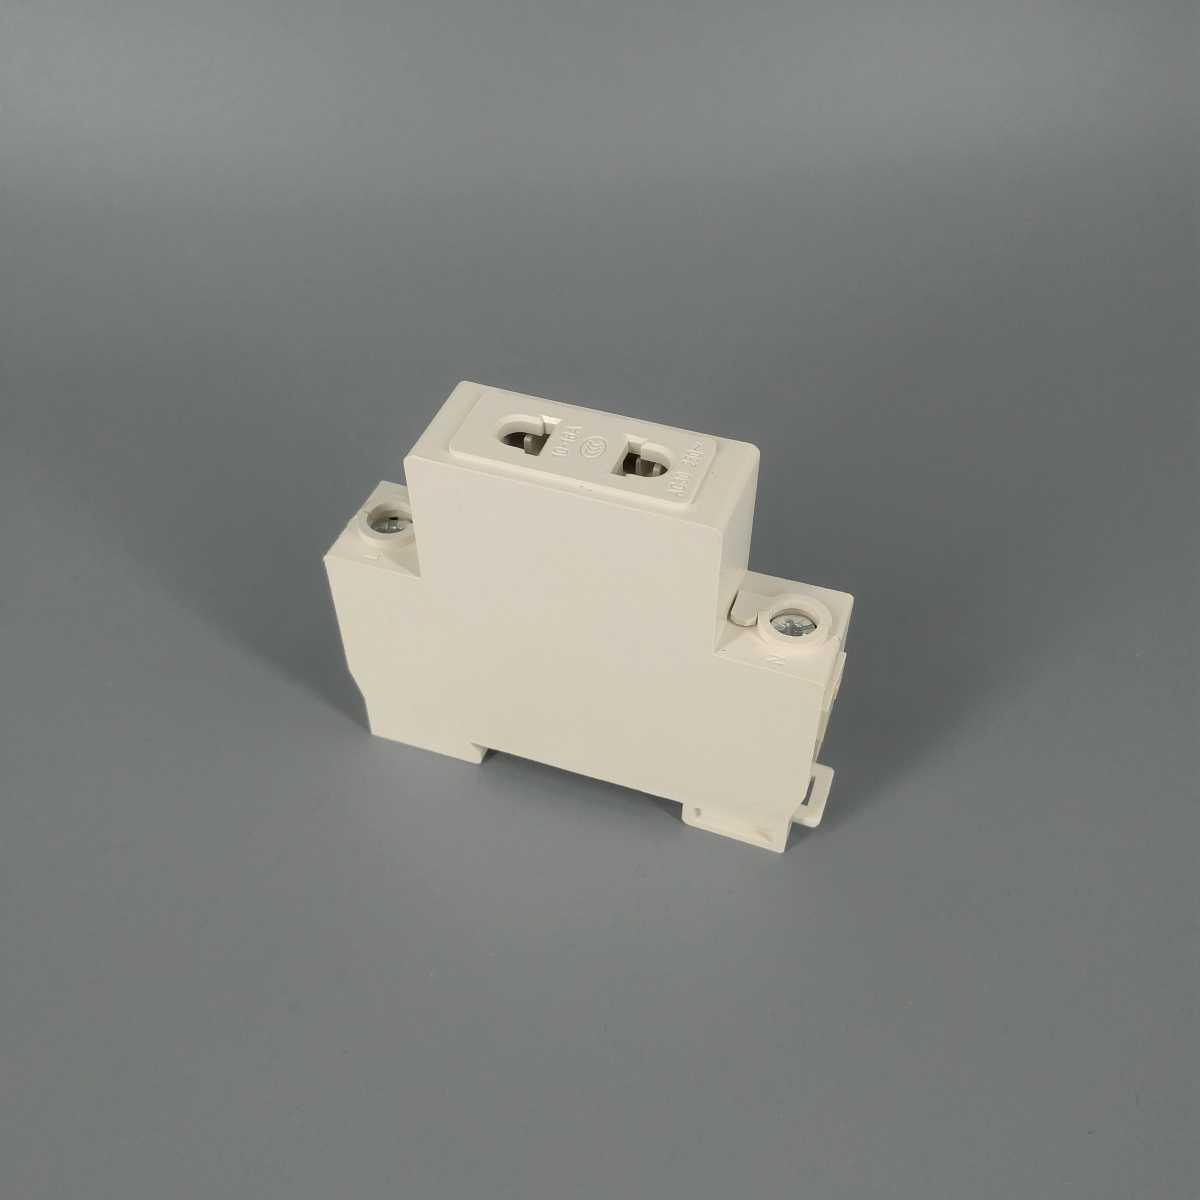 AC30 2 broches prise 35mm Din montage sur Rail prise modulaire 10-16A 250V